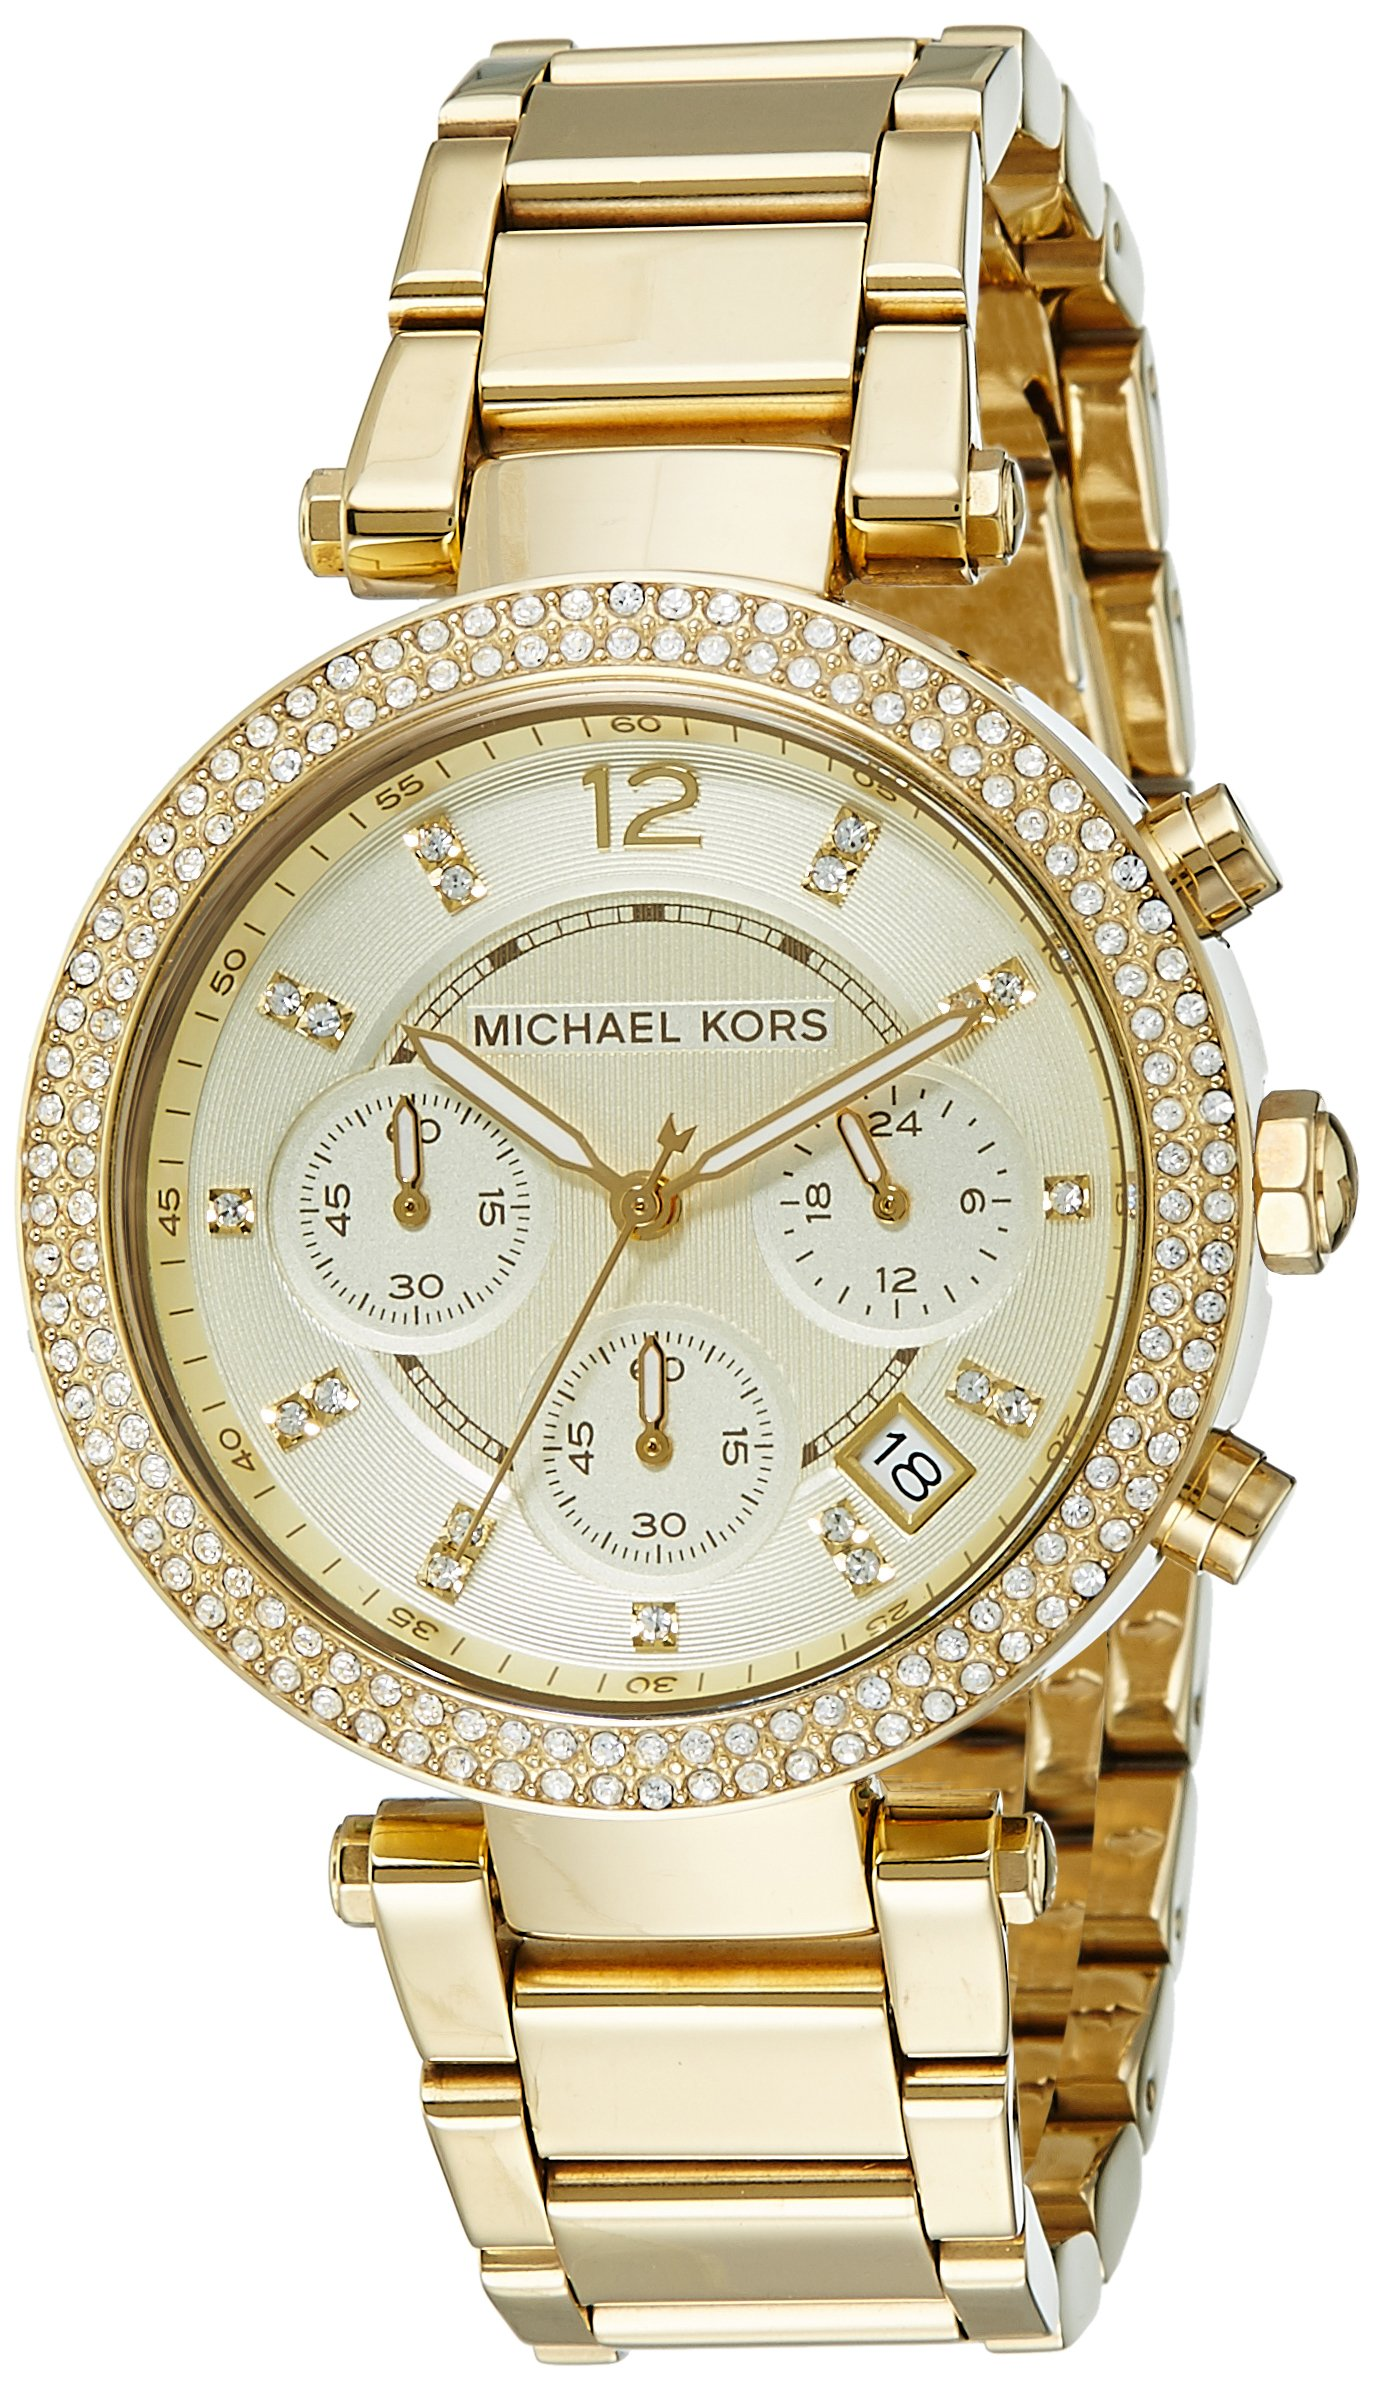 Michael Kors Women's Parker Gold-Tone Watch MK5354